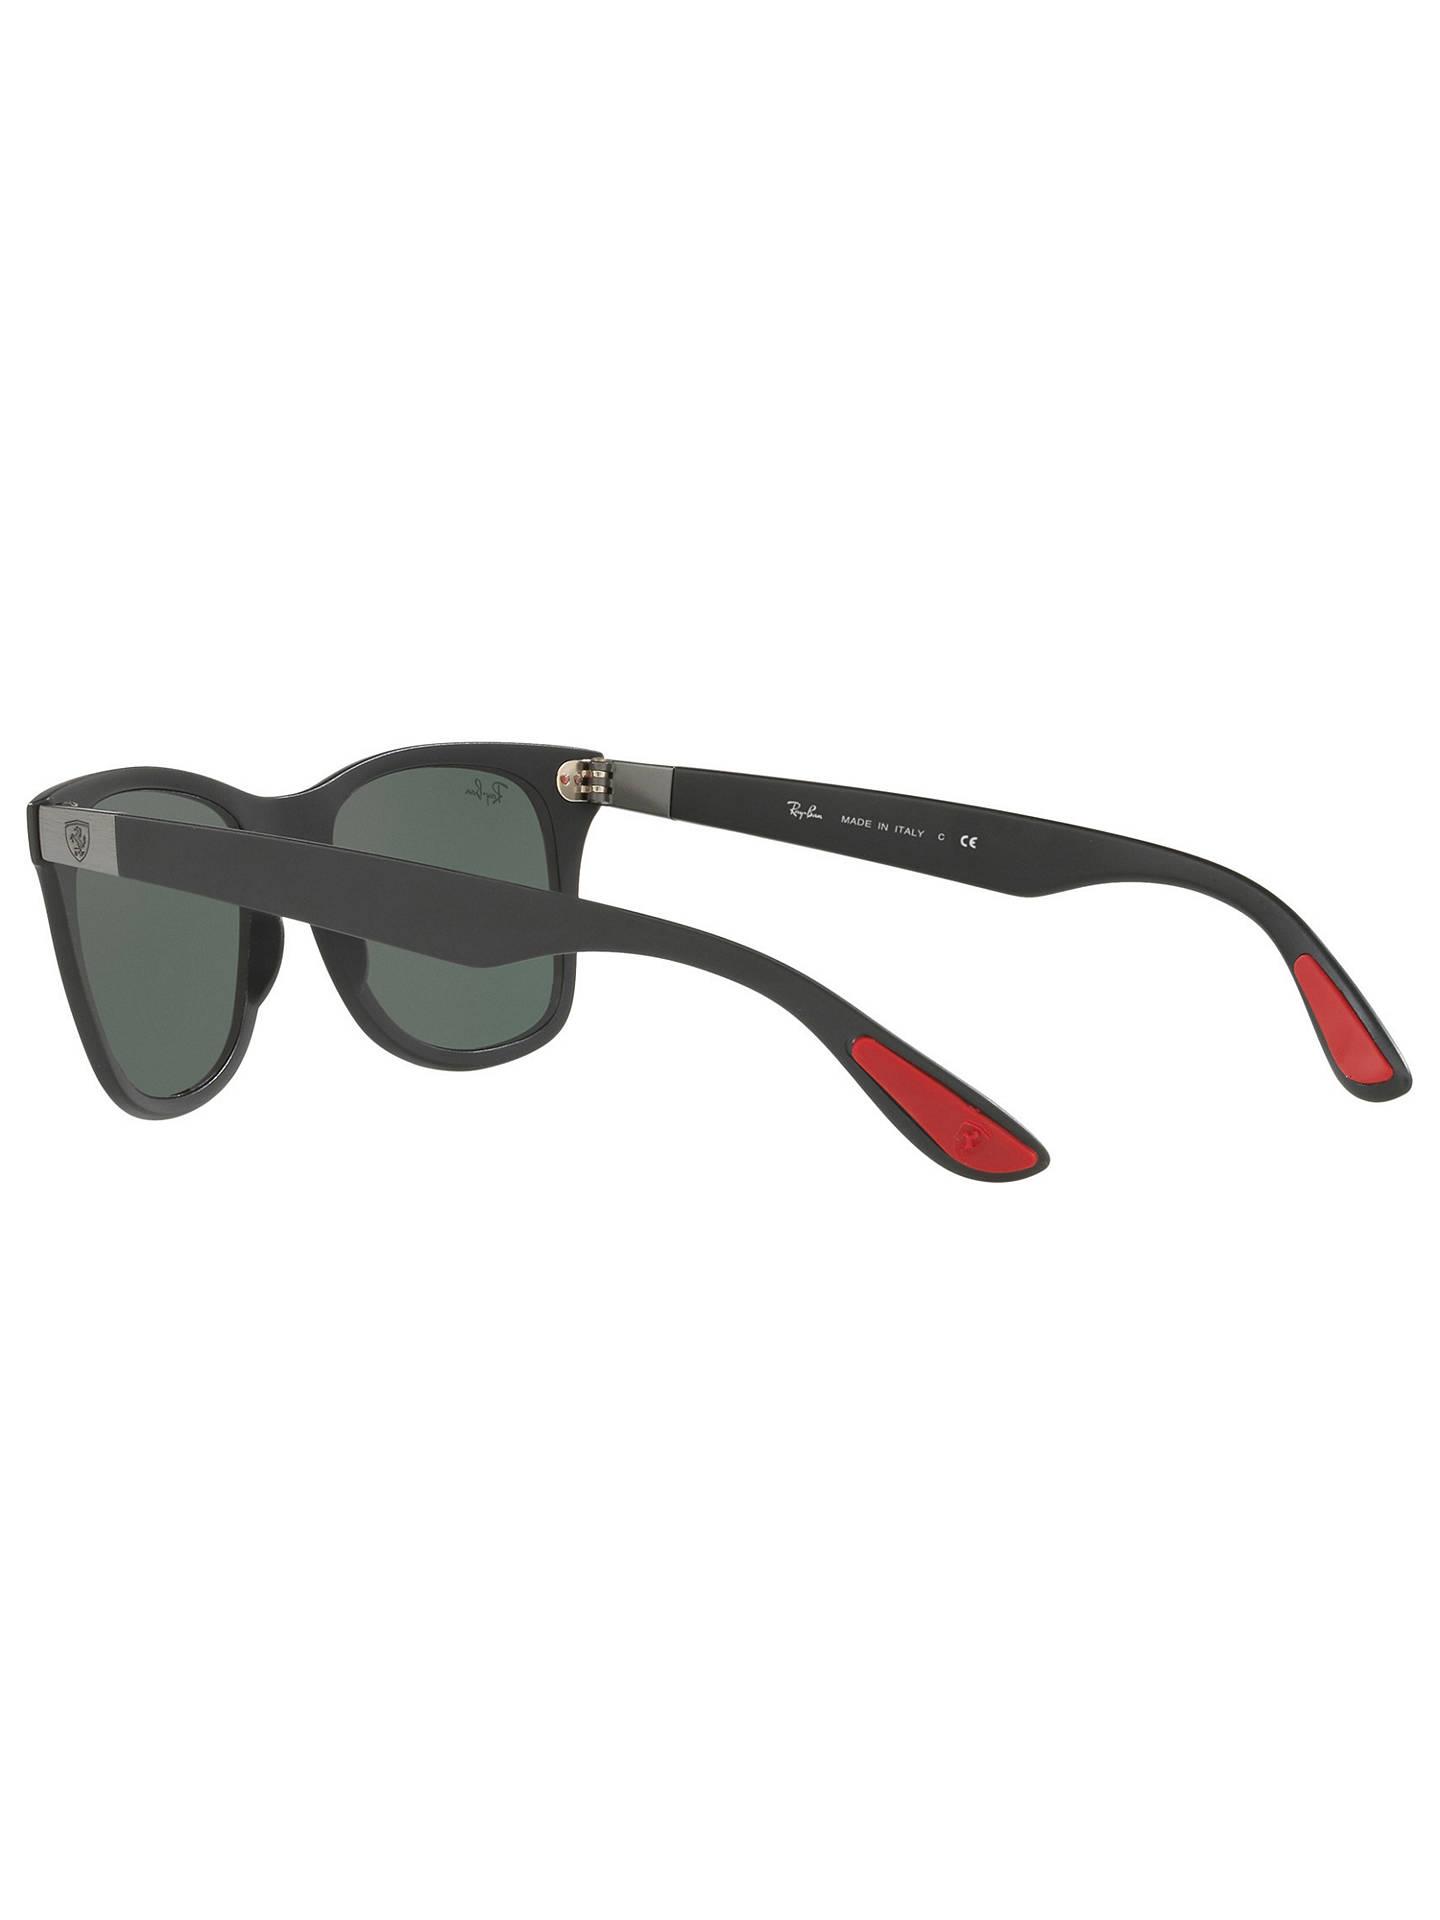 a3aa712cd0 ... where can i buy buyray ban rb4195m scuderia ferrari wayfarer sunglasses  black dark green online at